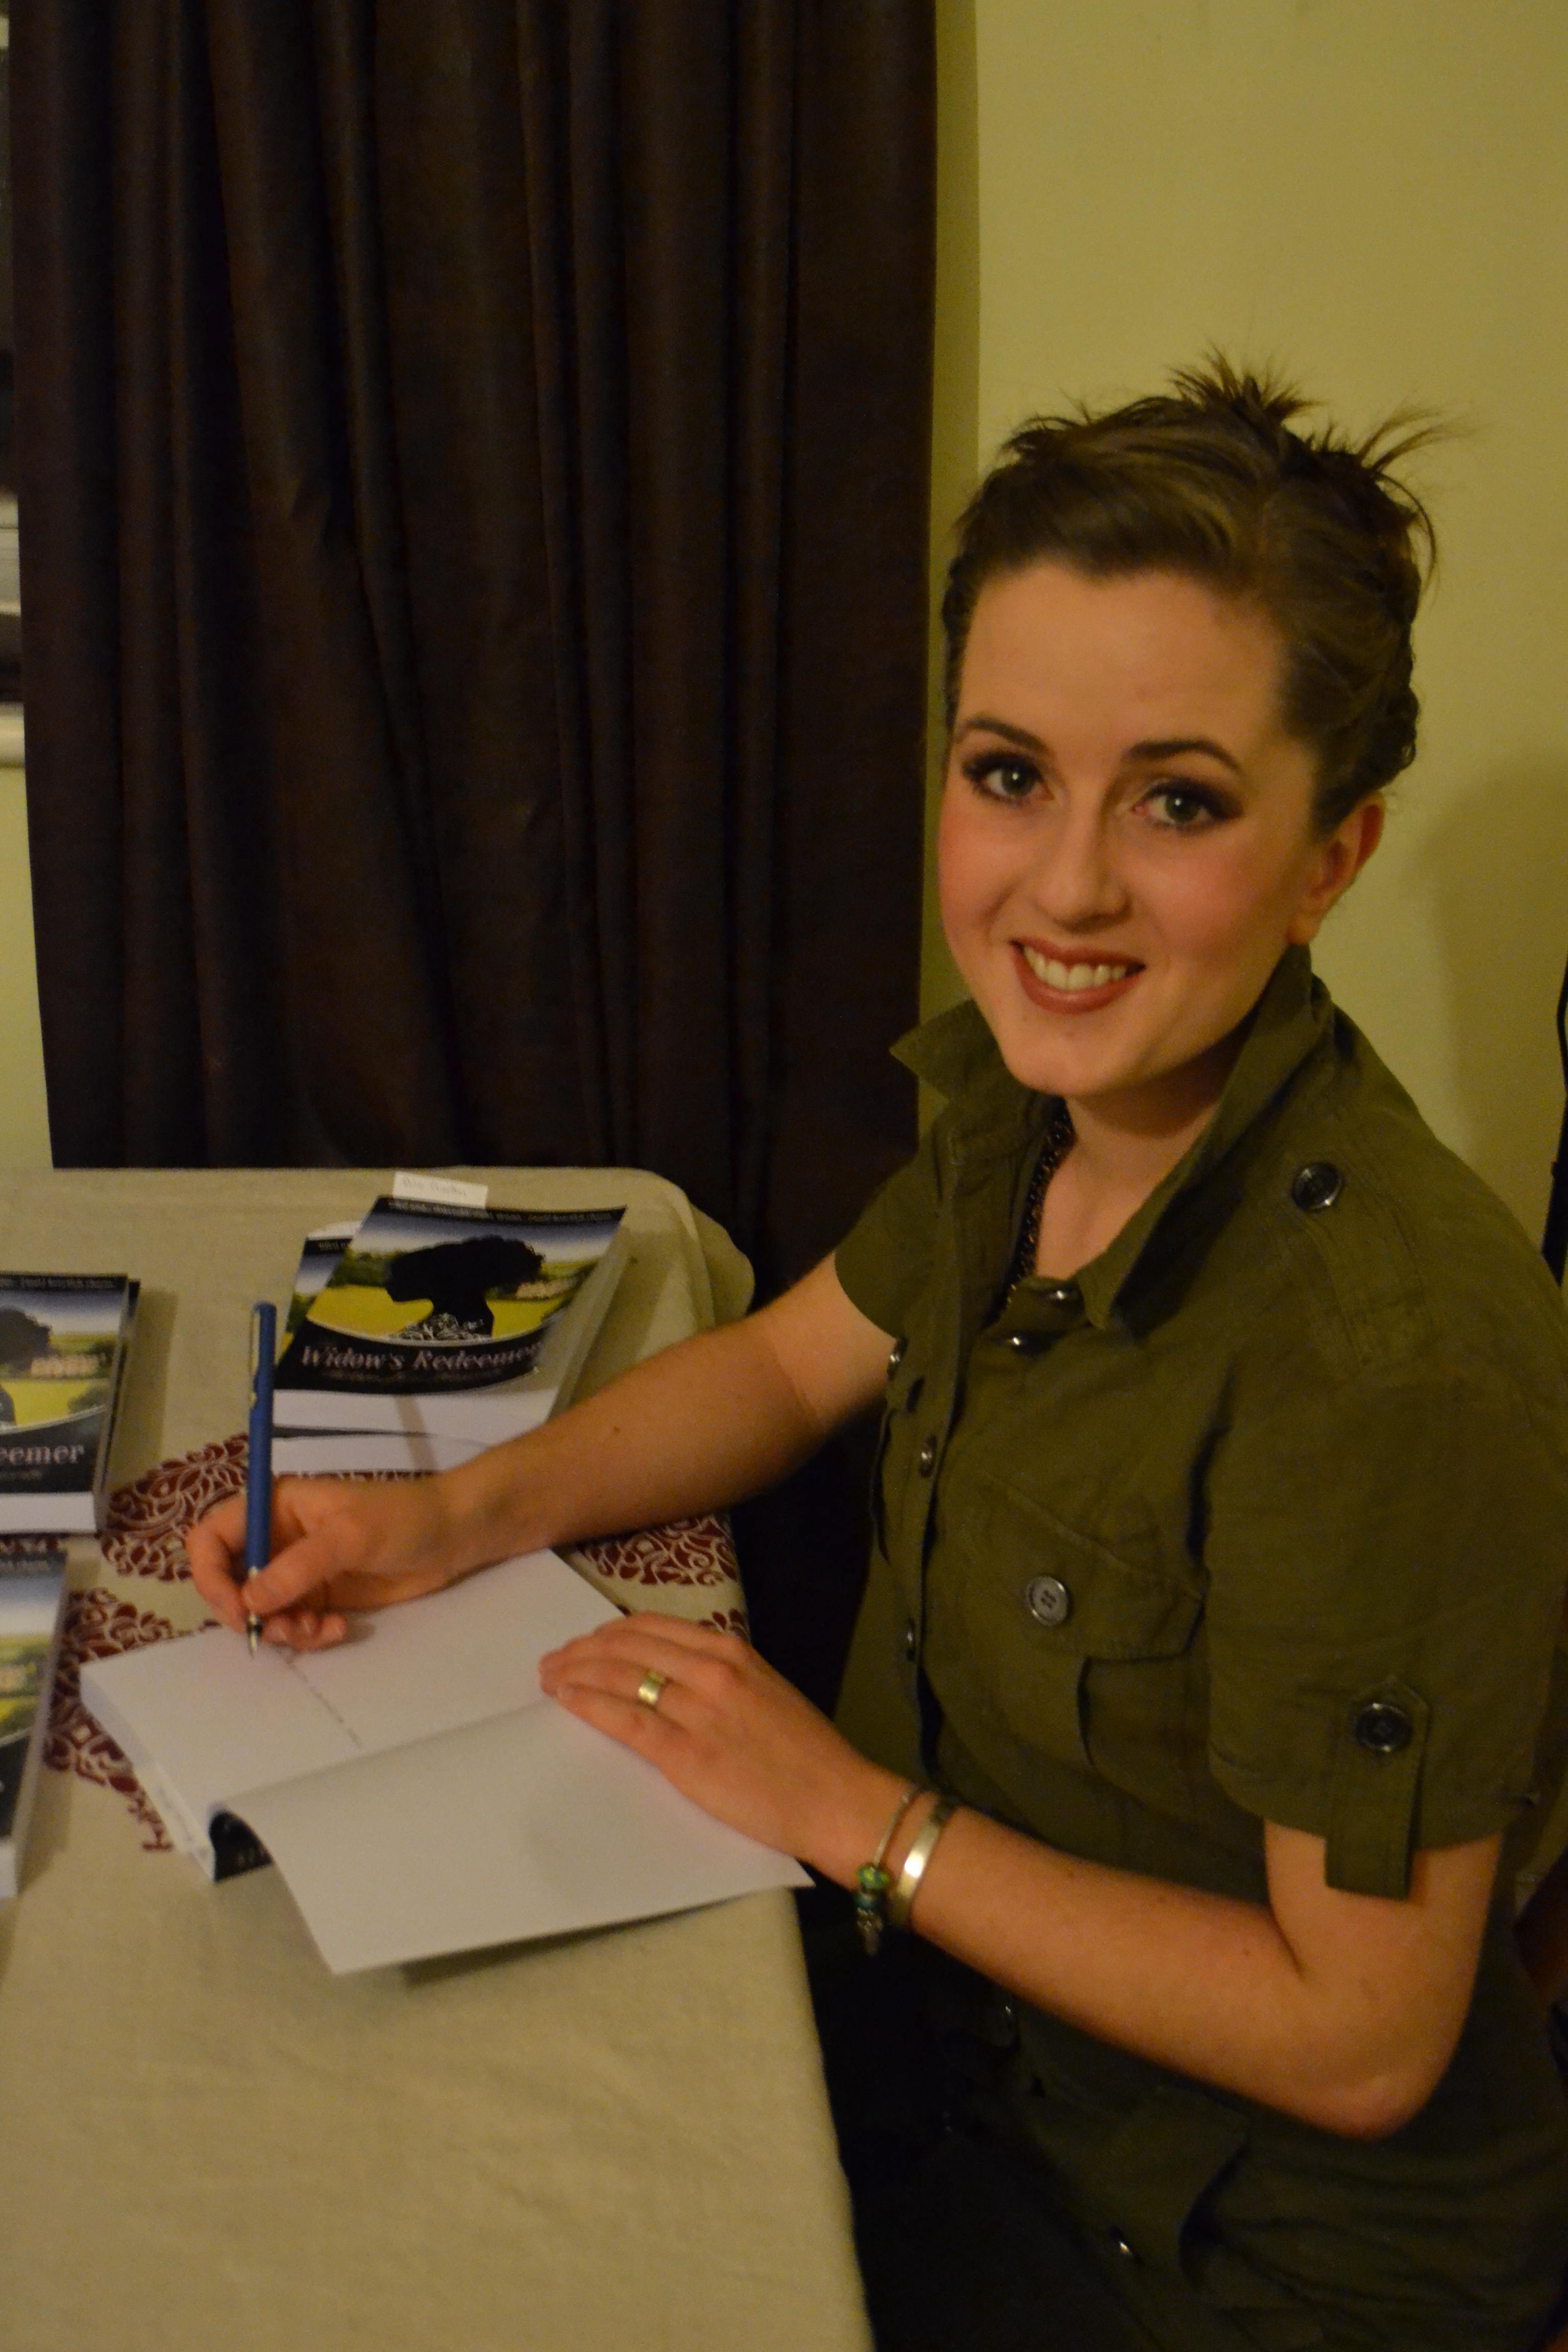 The Widow's Redeemer Launch Party - Philippa Jane Keyworth